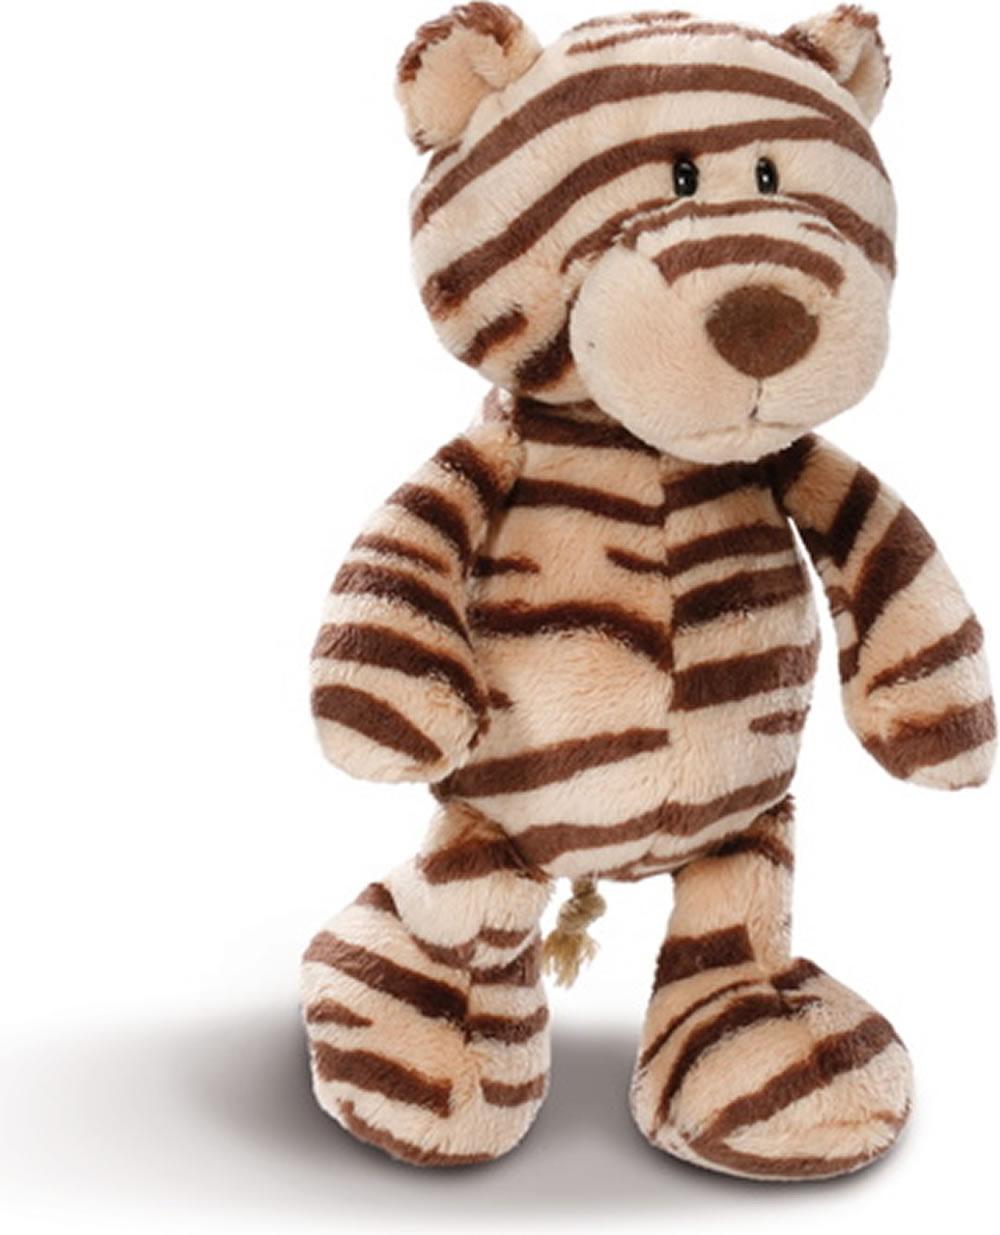 Plišana igračka ZOO FRIENDS Tiger